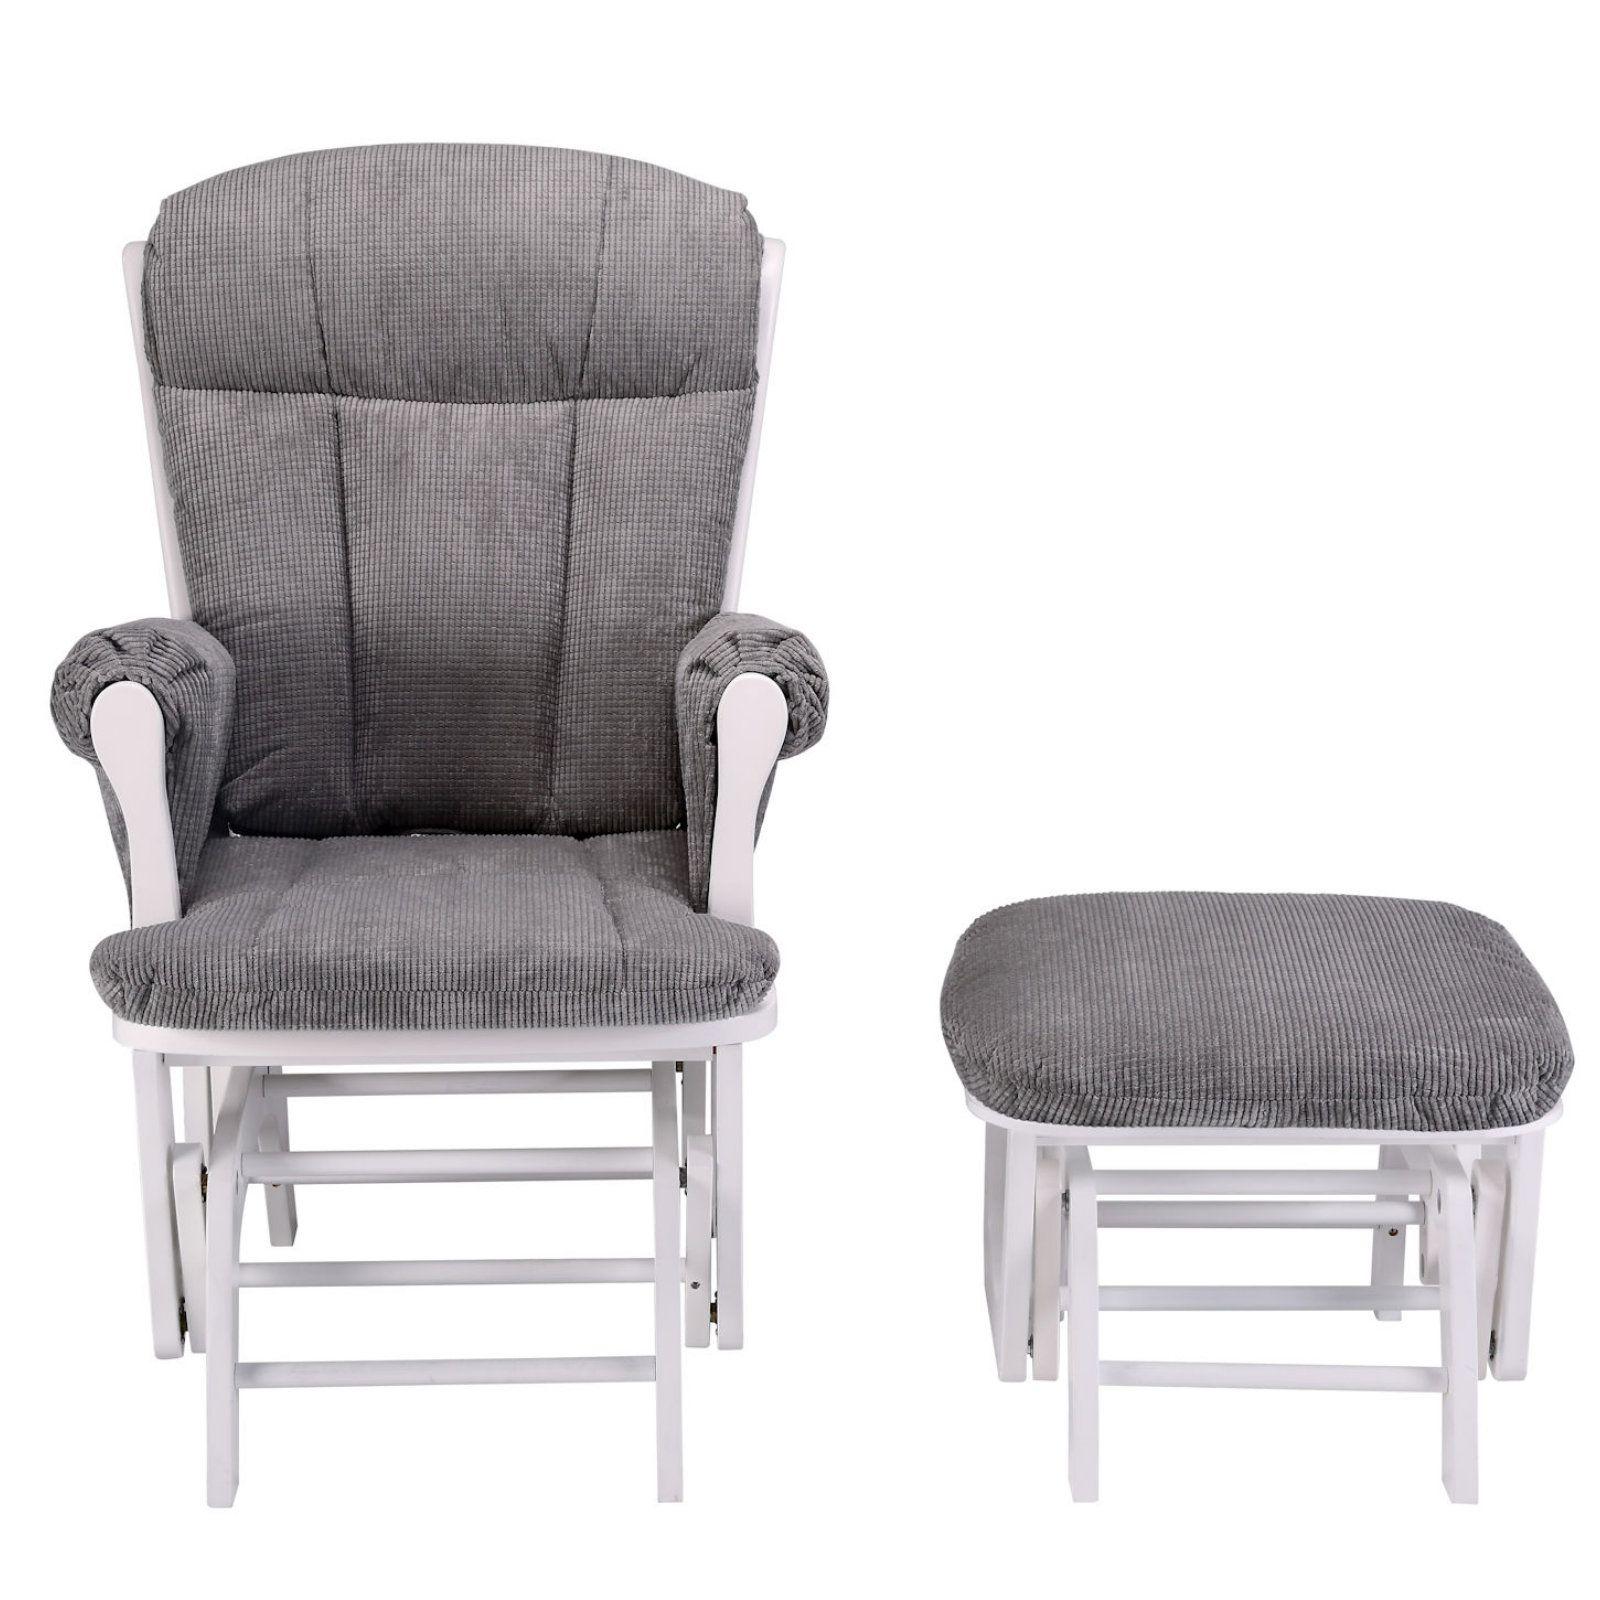 Mini Uno Prestige Nursing Glider Chair Footstool White Grey